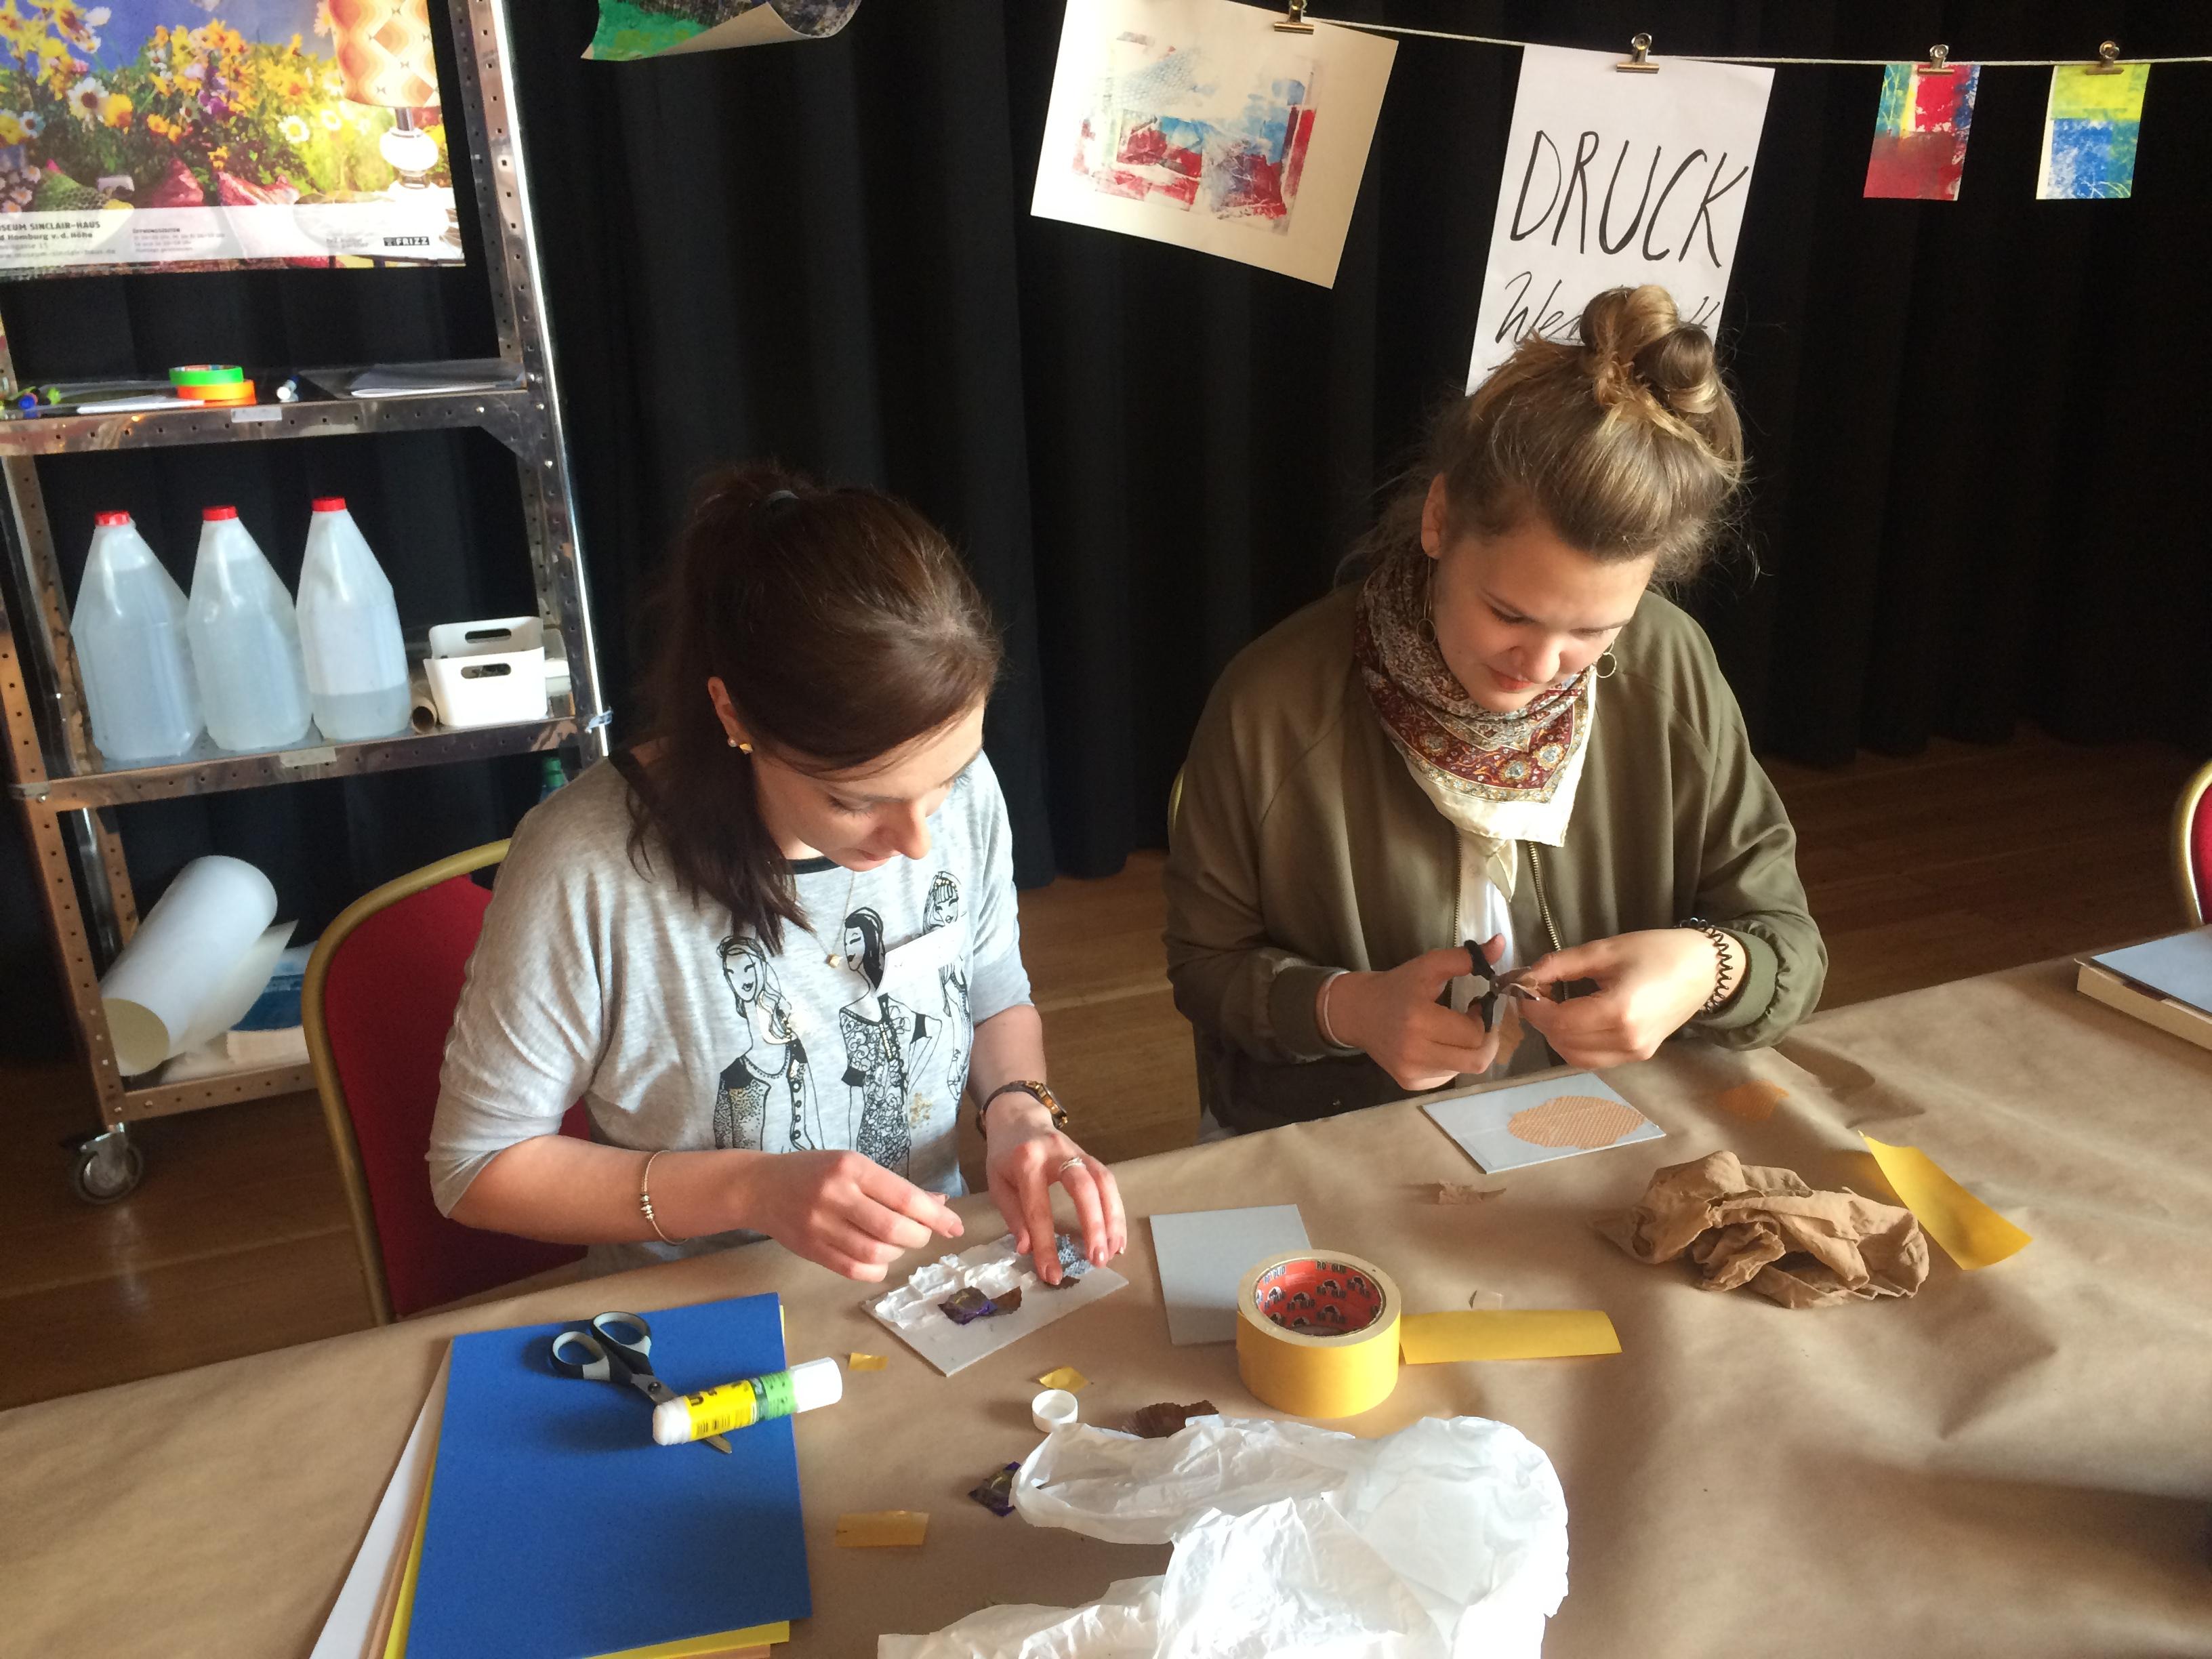 Altana Kultur Stiftung